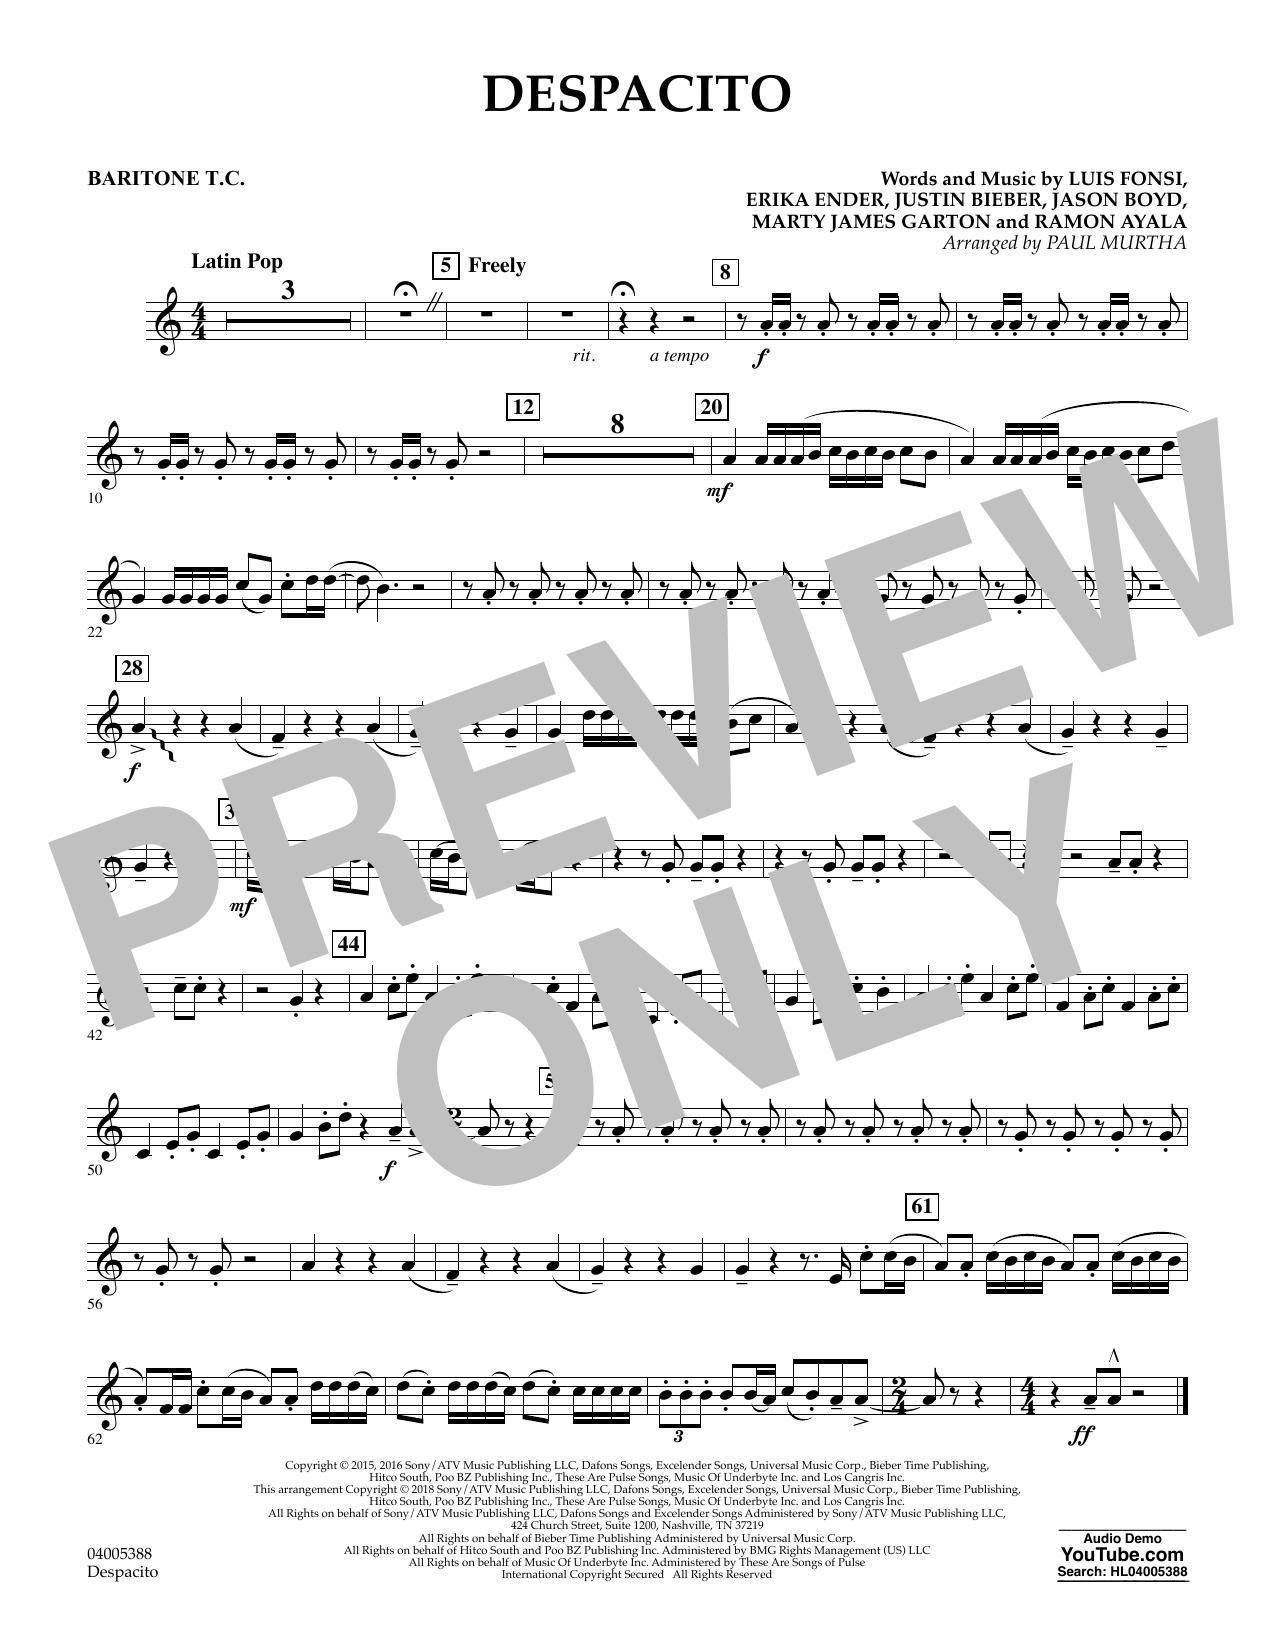 Despacito (arr. Paul Murtha) - Baritone T.C. (Concert Band)